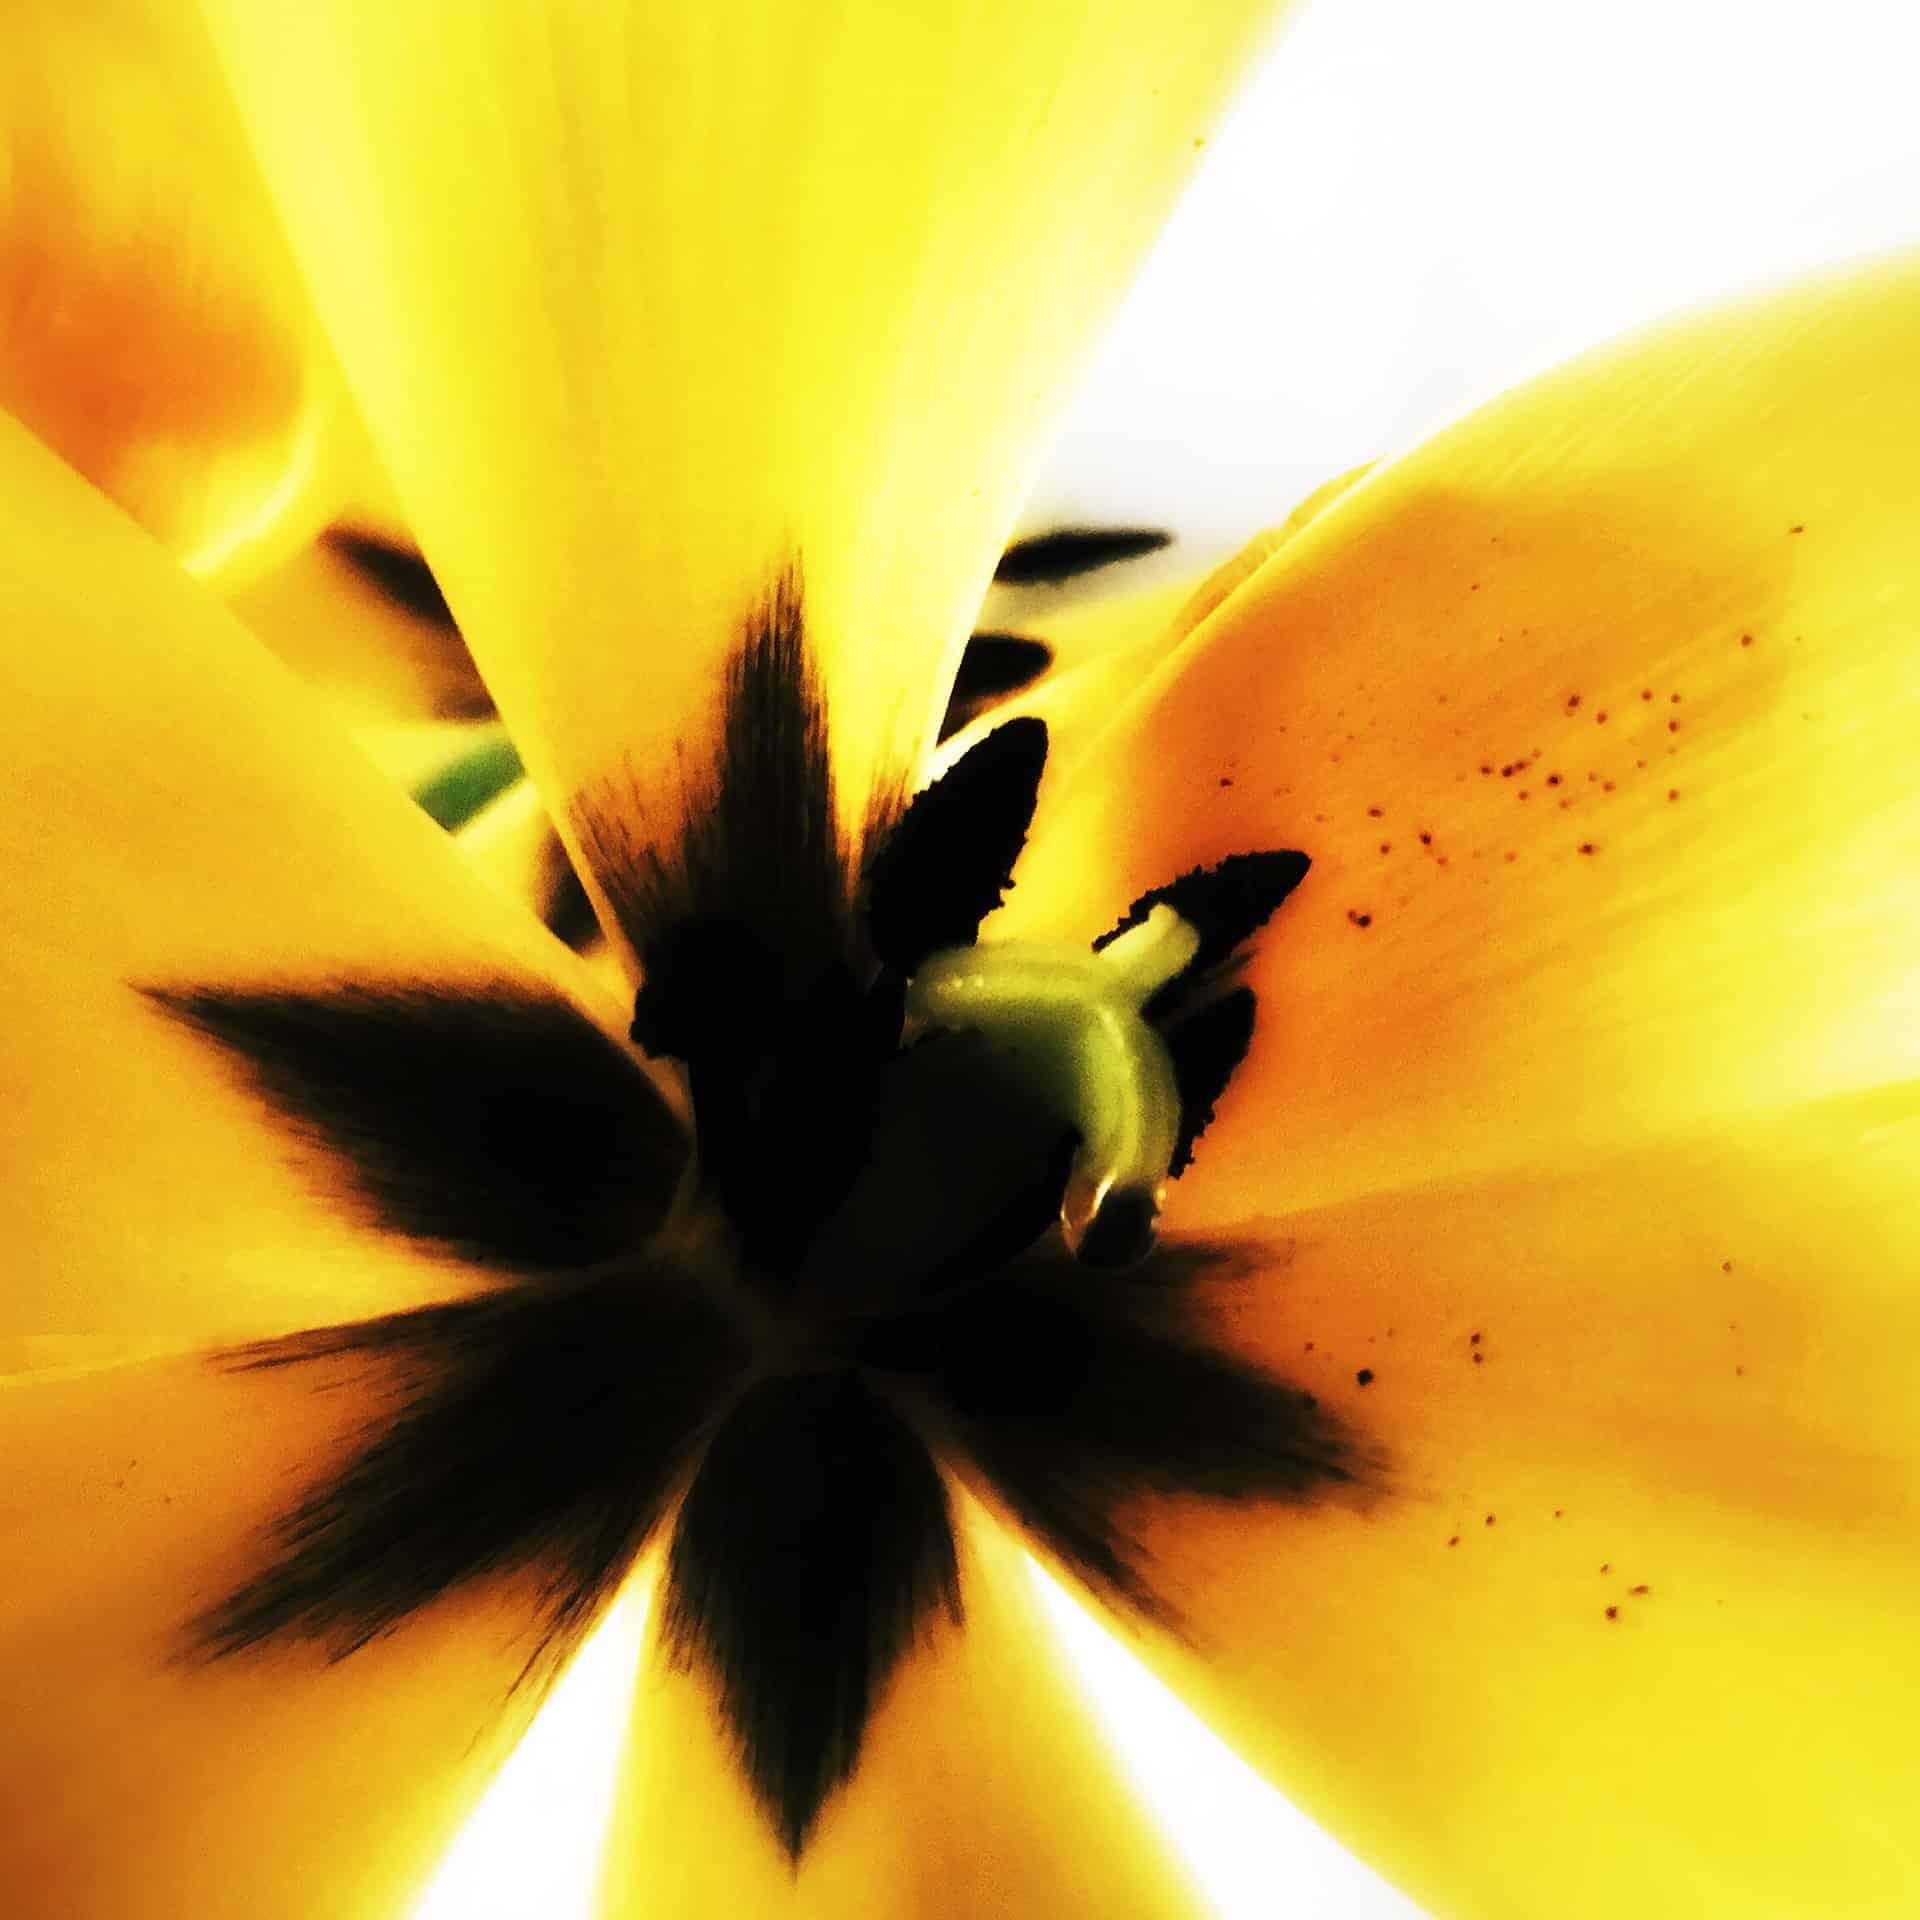 artnorama - Yellow Blossom